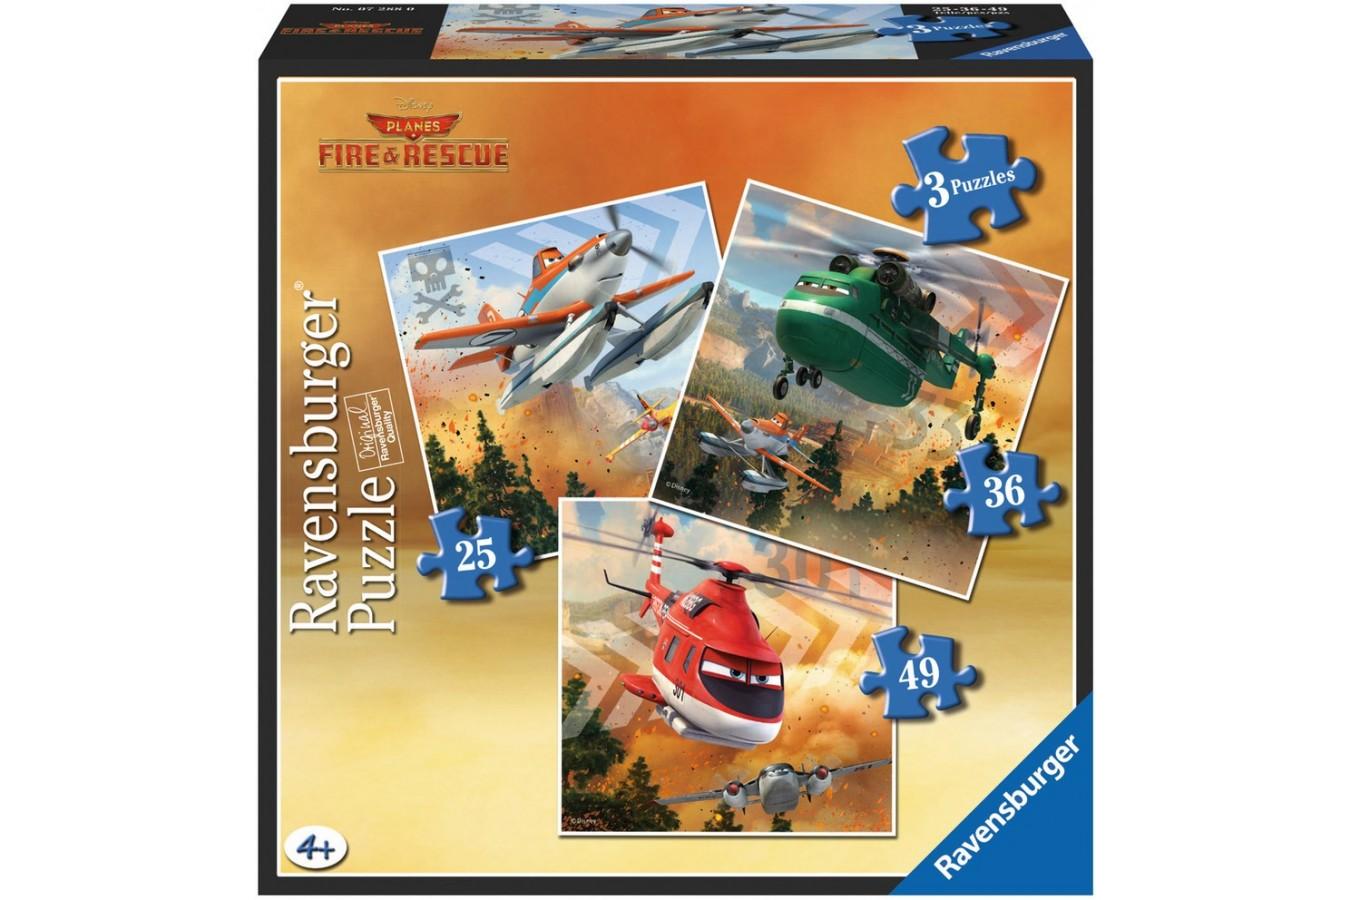 Puzzle Ravensburger - Planes Echipa De Salvare Impotriva Focului, 25/36/49 piese (07288)